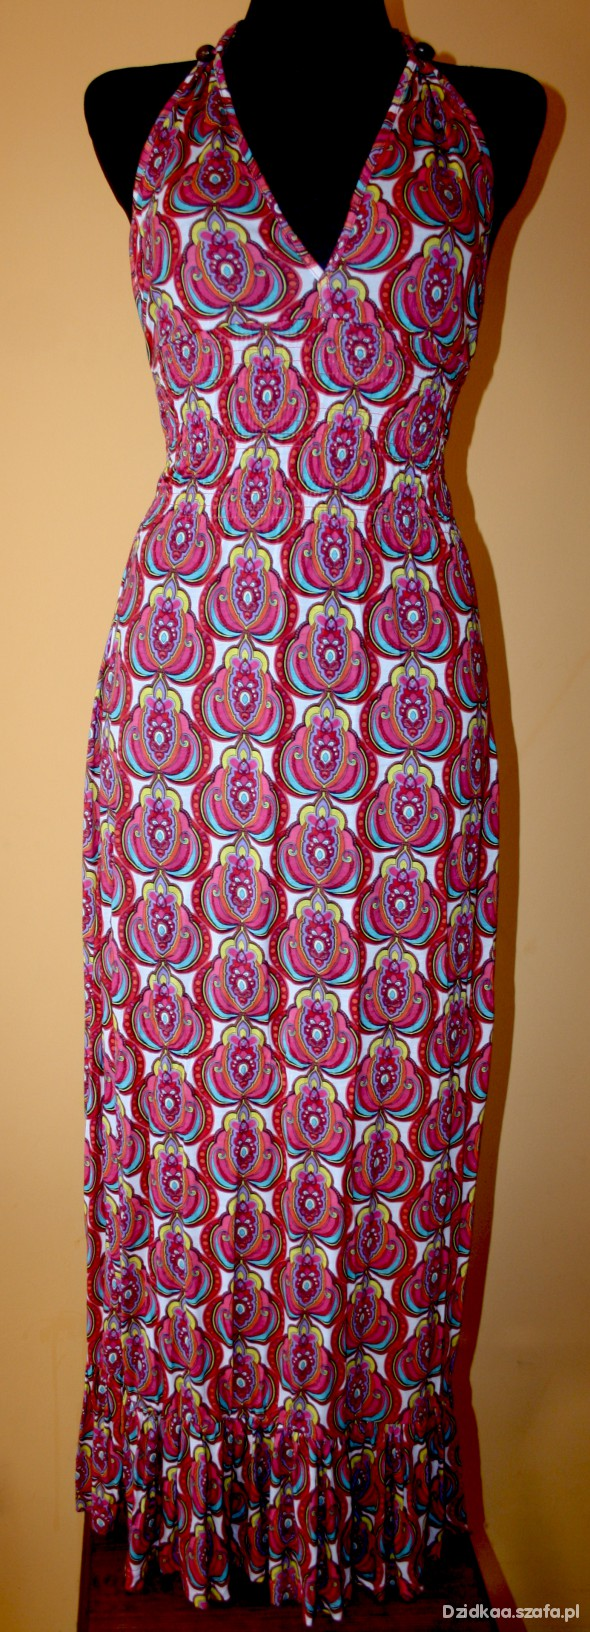 Suknie i sukienki sukienka maxi